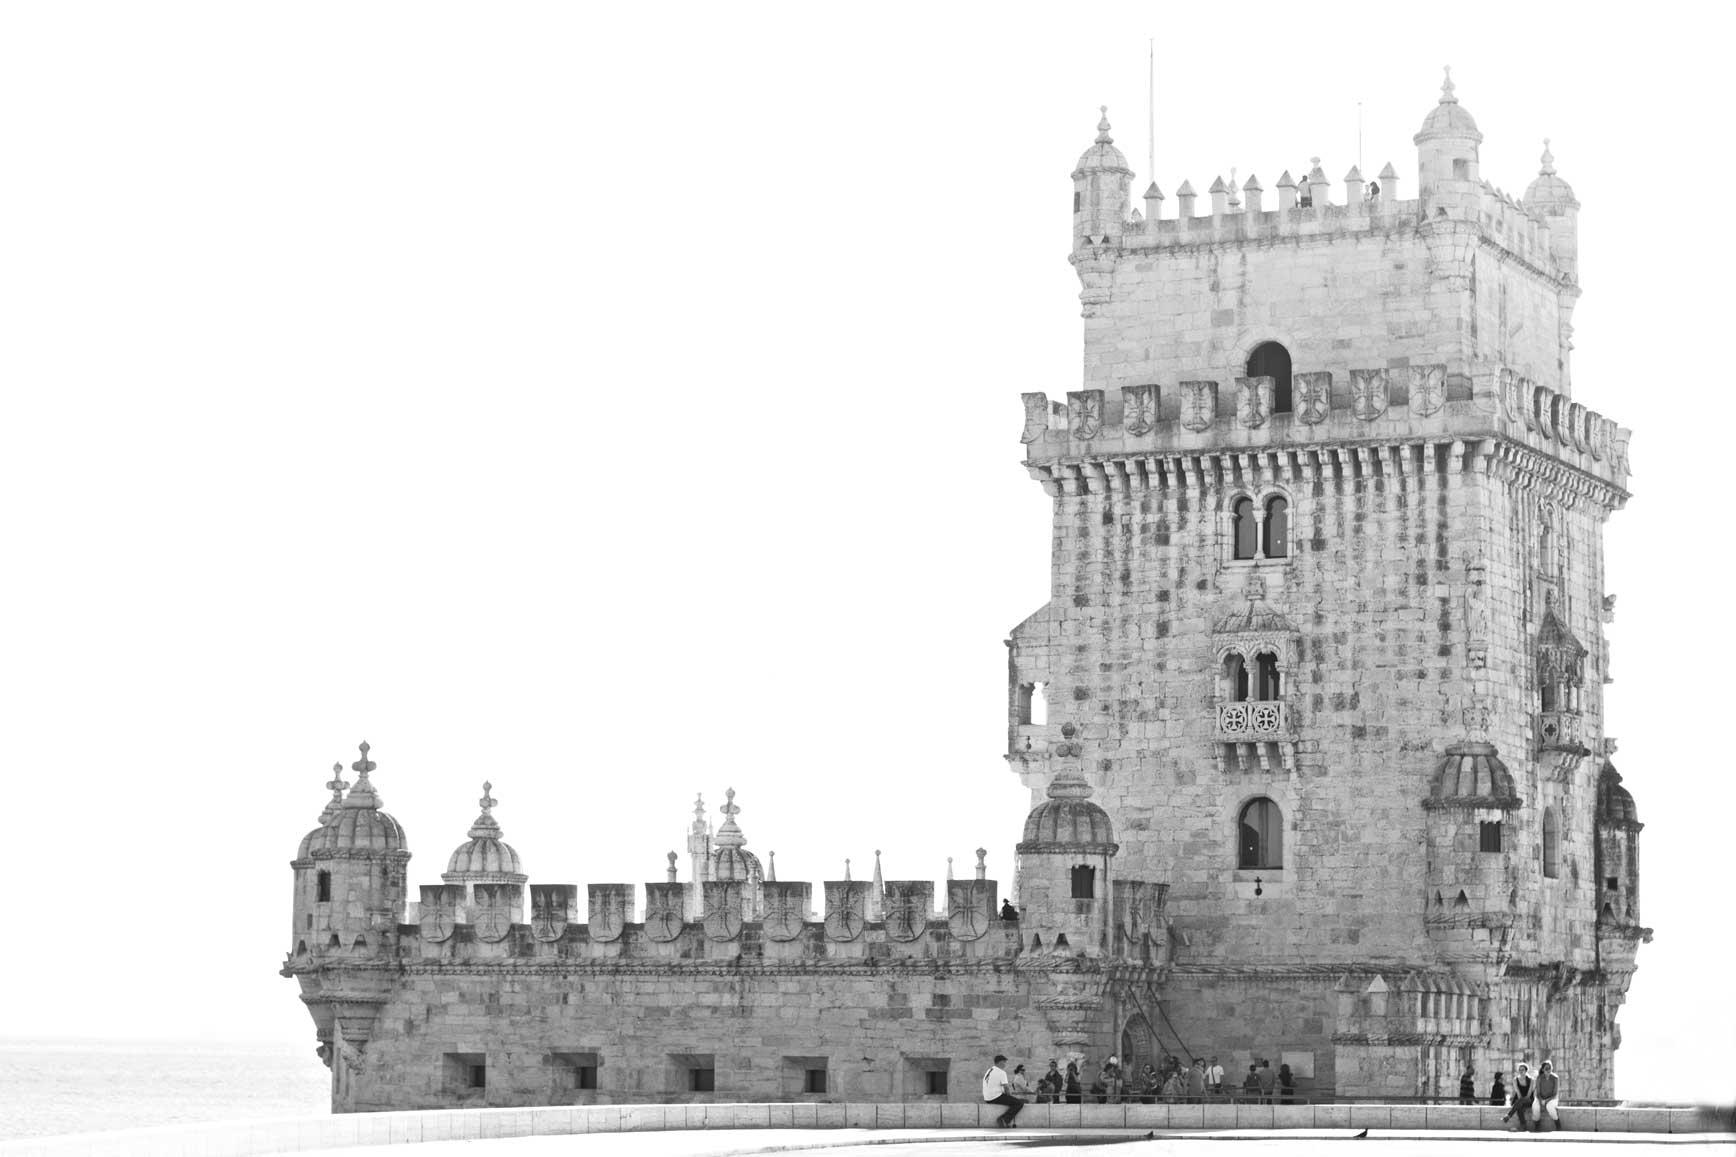 Lisboa Torre de Belem - claraBmartin